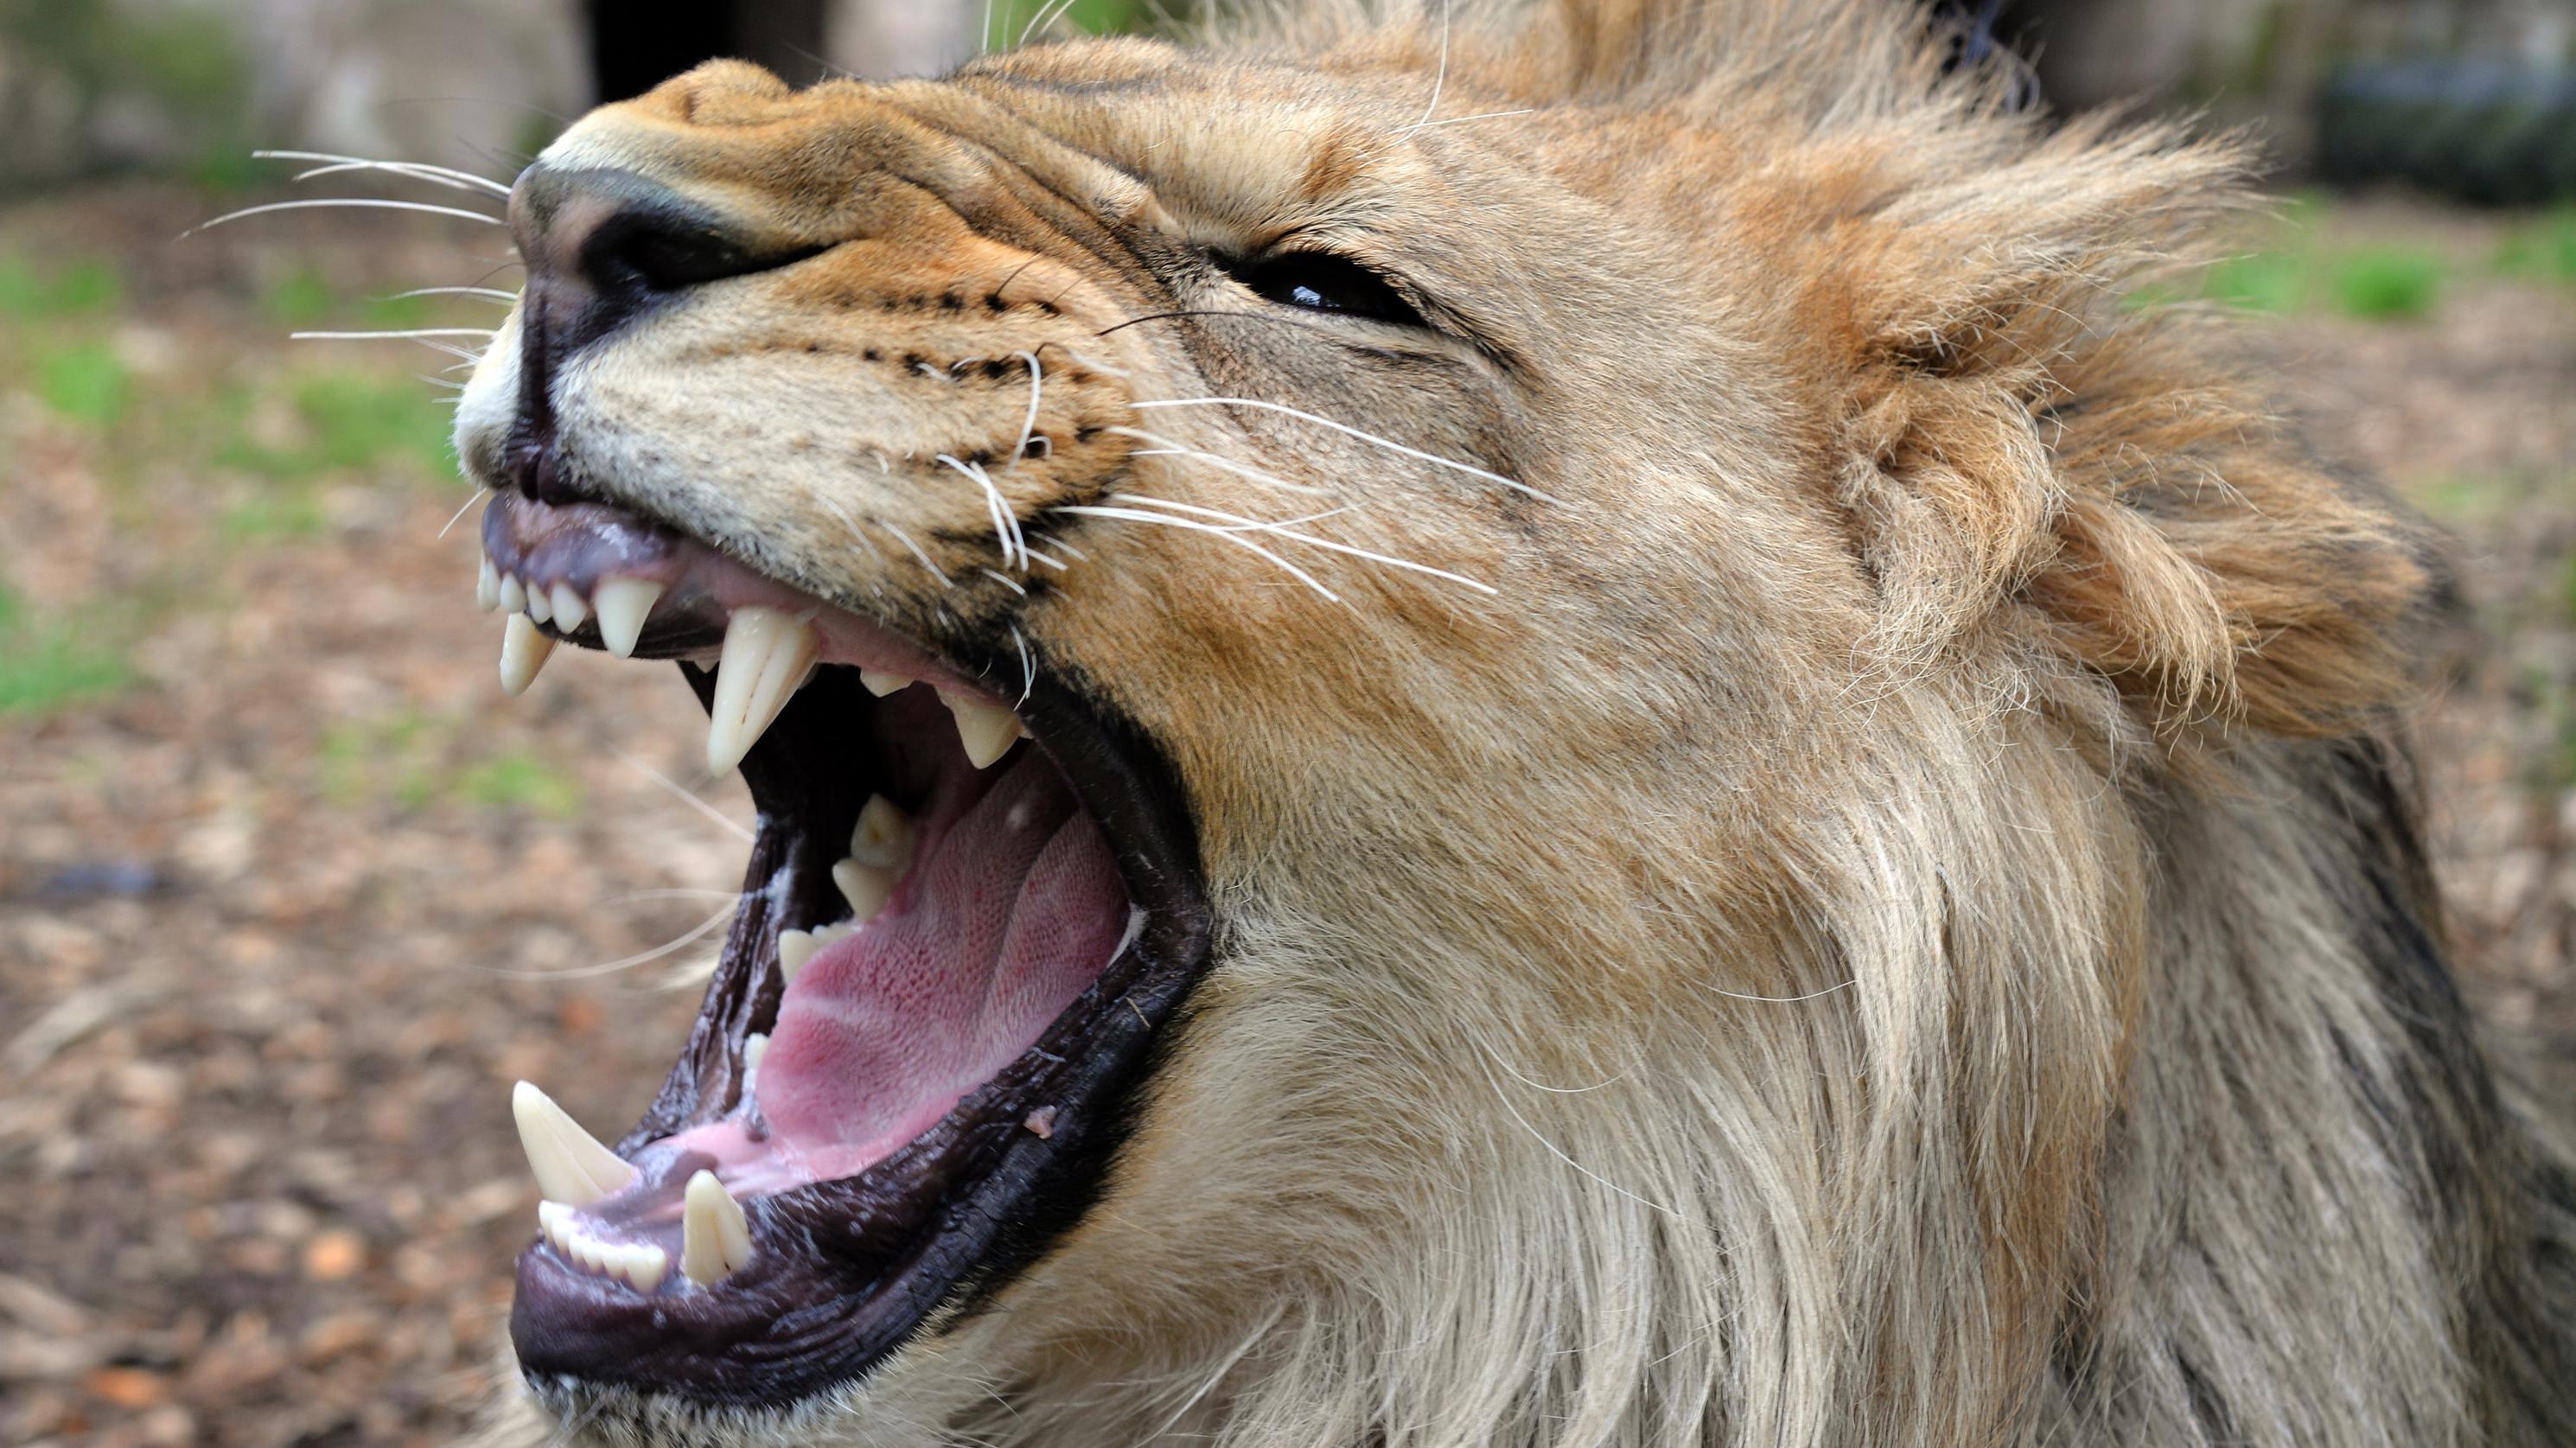 Löwe im Zoo (Symbolbild)